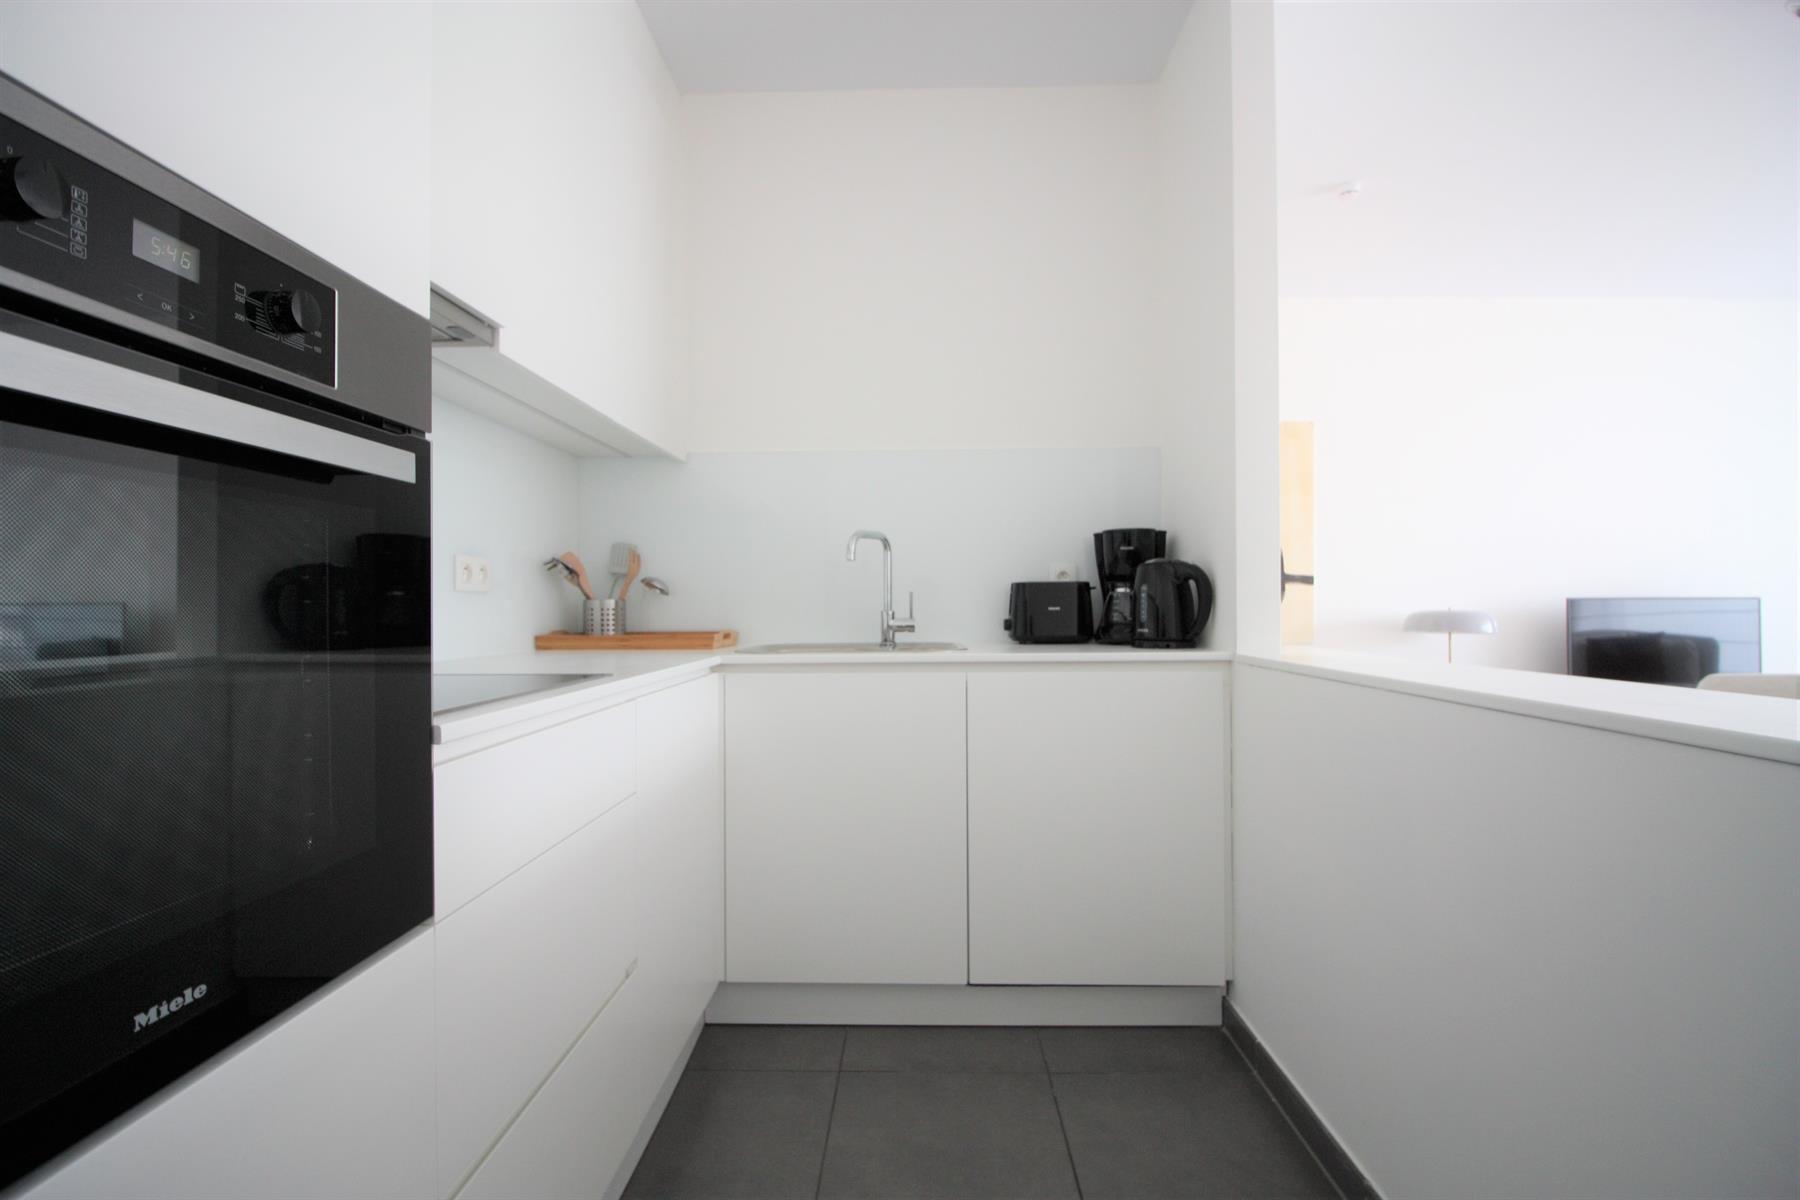 Appartement - Woluwe-Saint-Lambert - #4395355-4